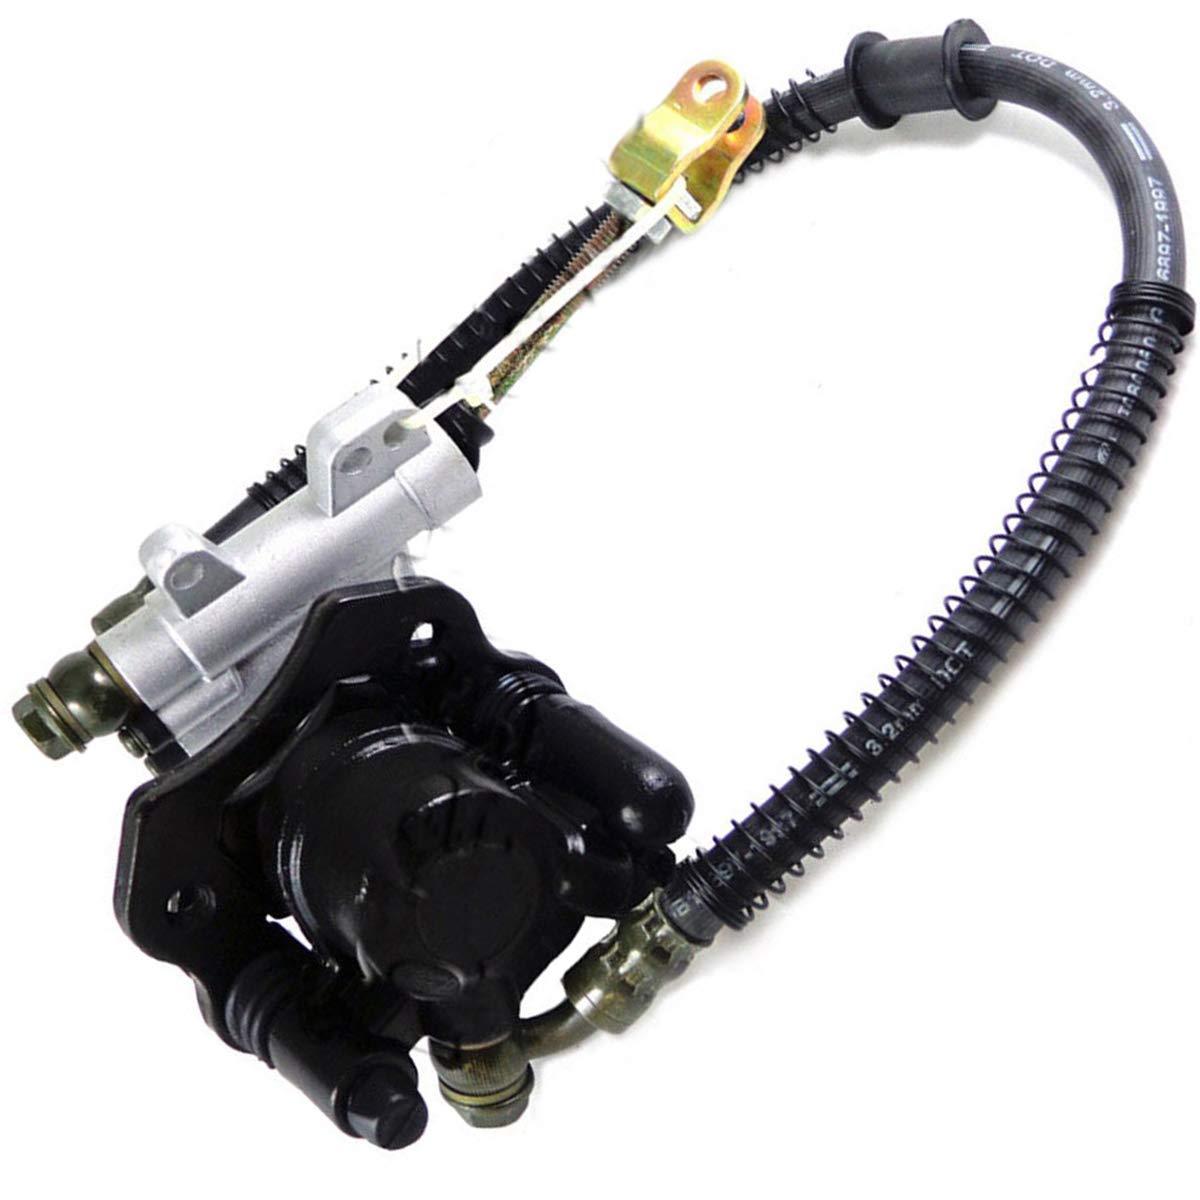 Rear Hydraulic Brake Master Cylinder Caliper Assembly with Pads for 50cc 70cc 90cc 110cc 125cc ATV Quad Taotao Sunl Roketa NST